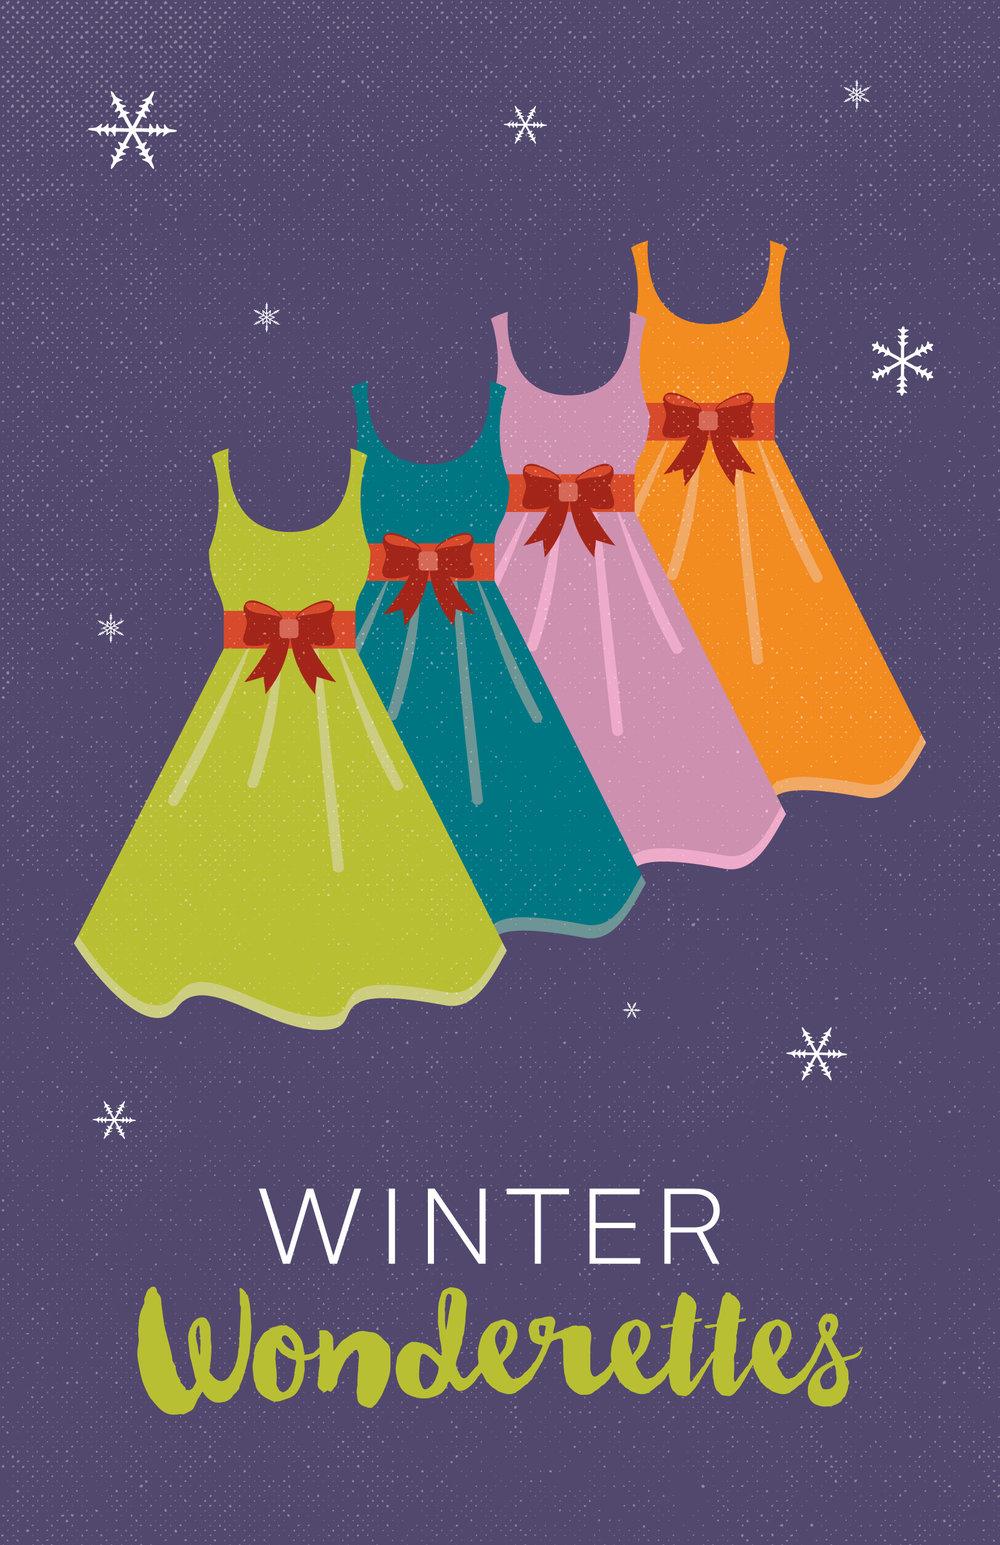 1819-04-Winter-Wonderettes-Show-Image-Vertical.jpg